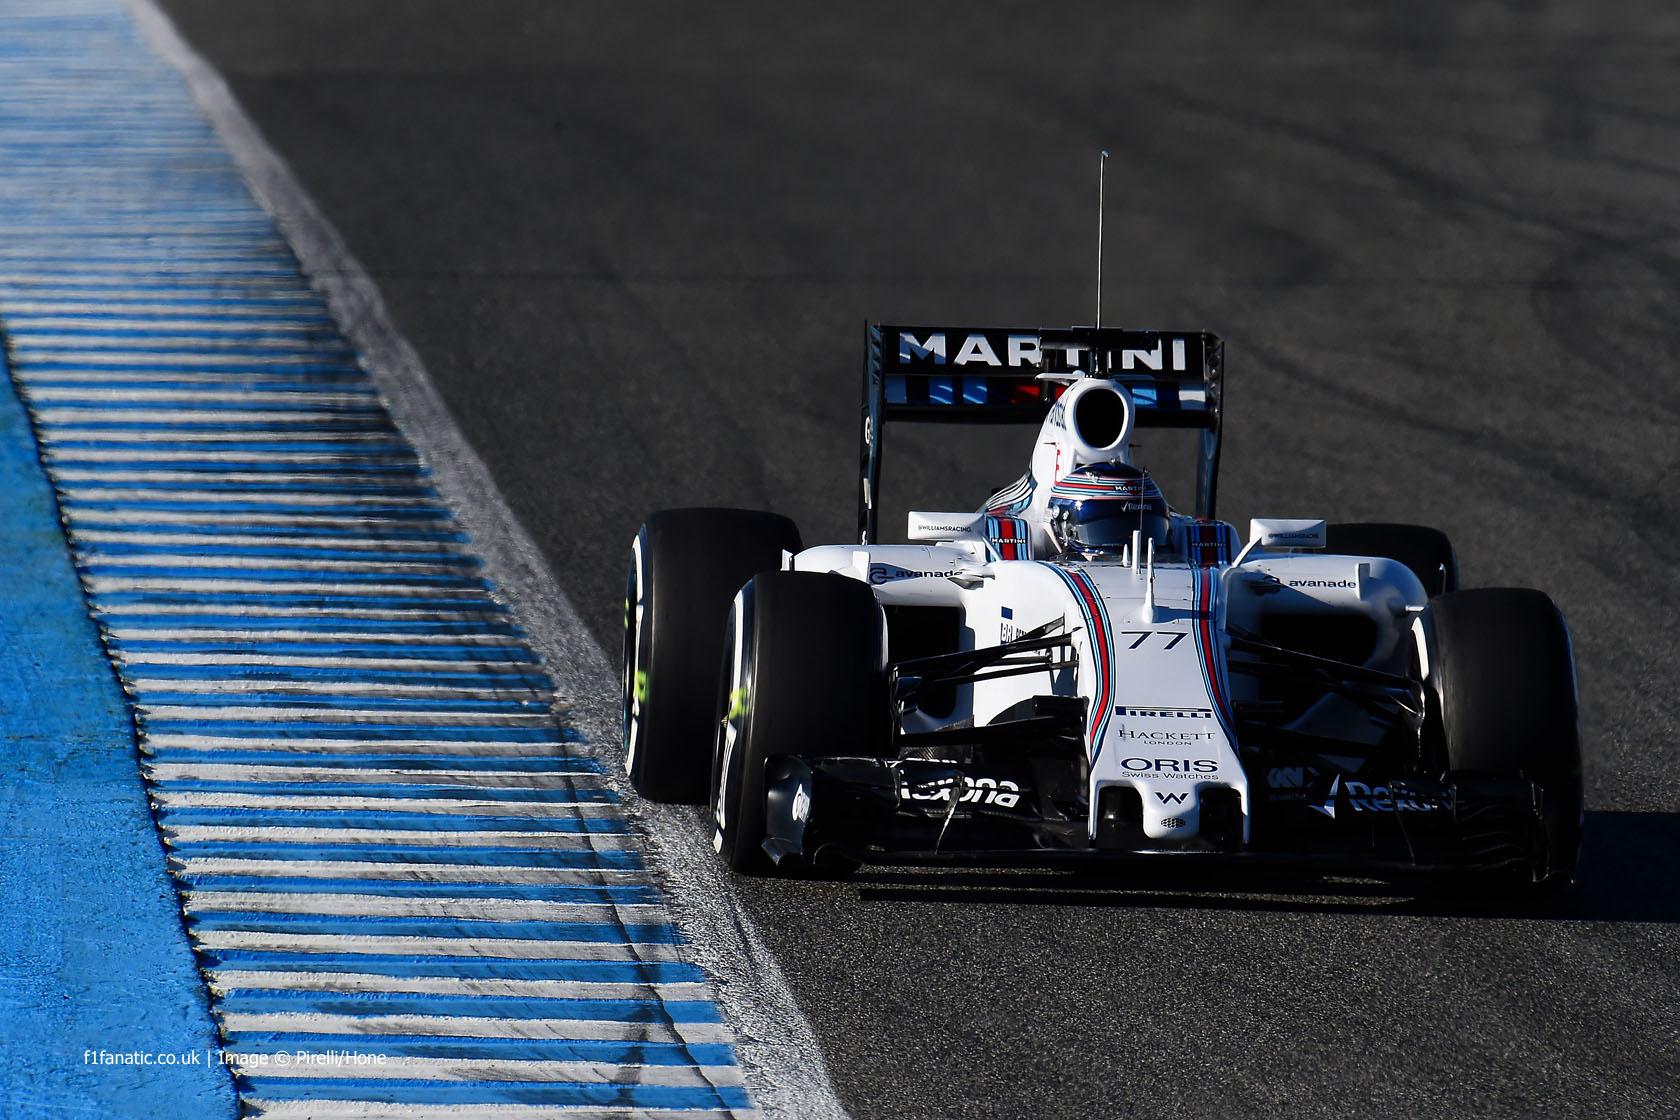 Valtteri Bottas, Williams, Circuito de Jerez, 2015